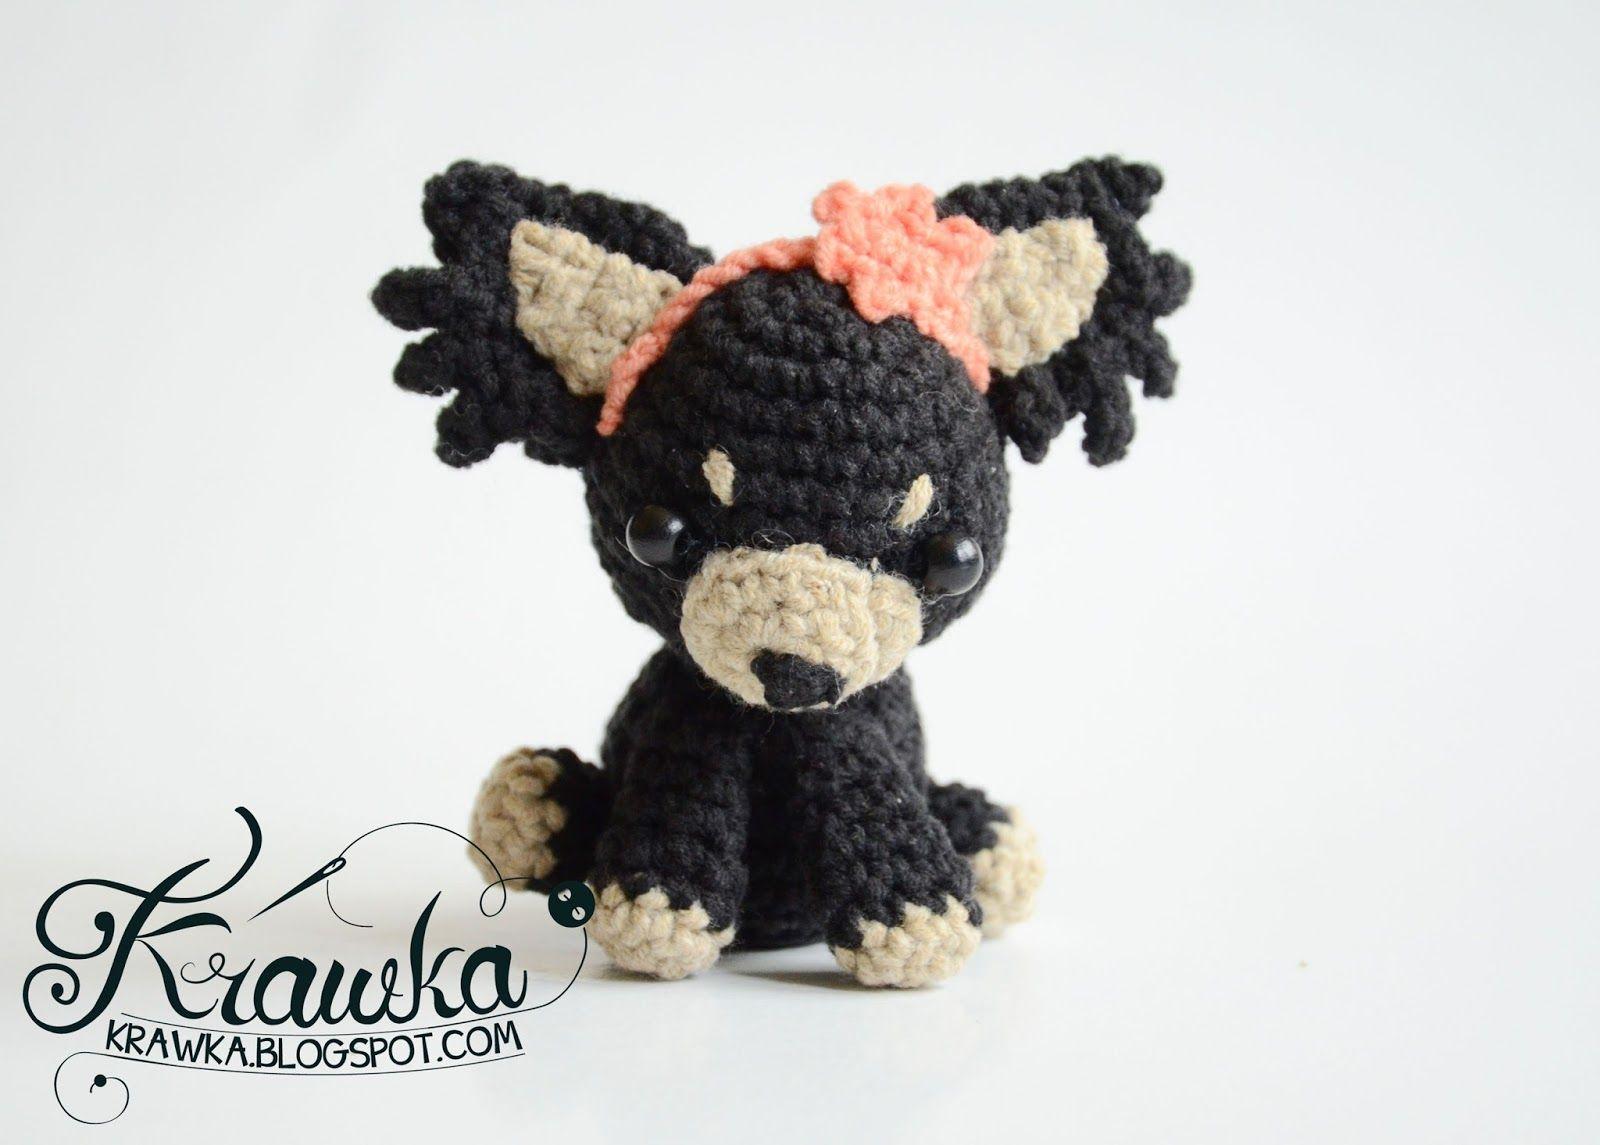 Krawka: Cute crochet dogs wedding gift - russian toy dog, free ...